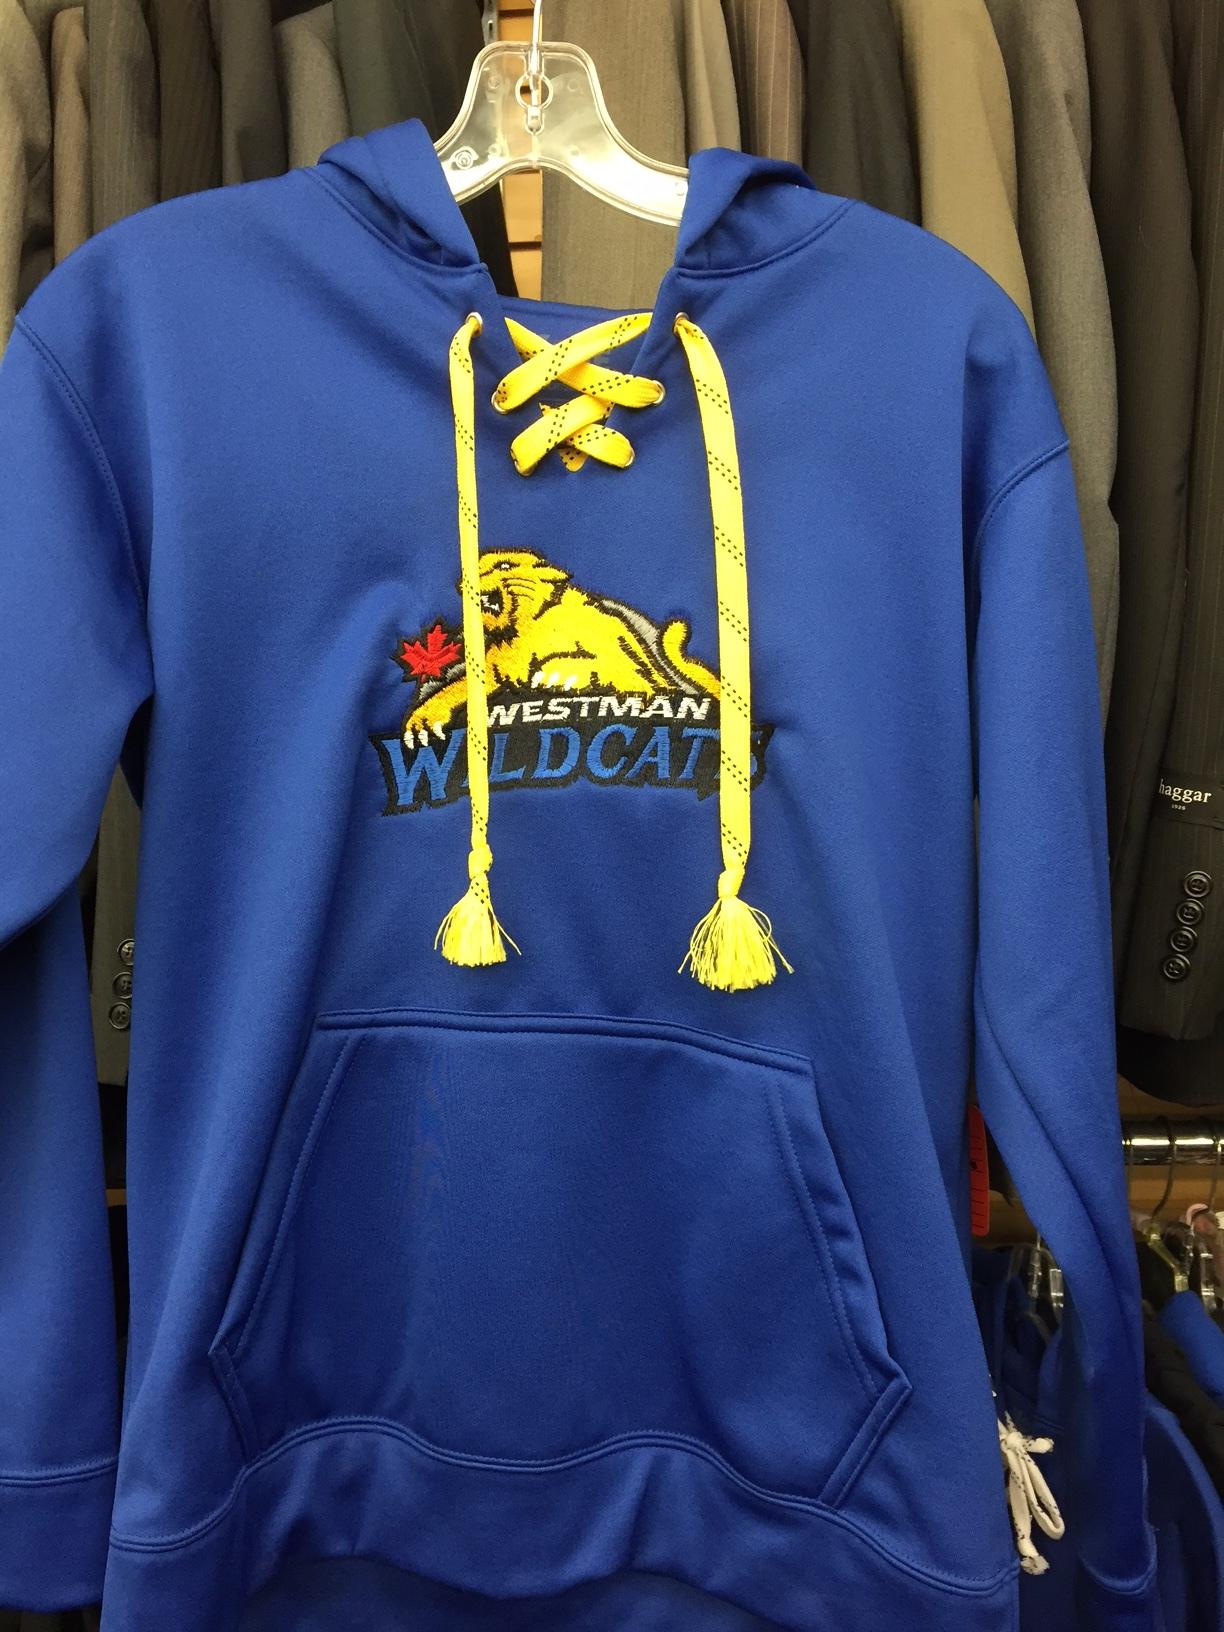 https://0901.nccdn.net/4_2/000/000/053/0e8/Blue-skate-lace-hoodie.JPG